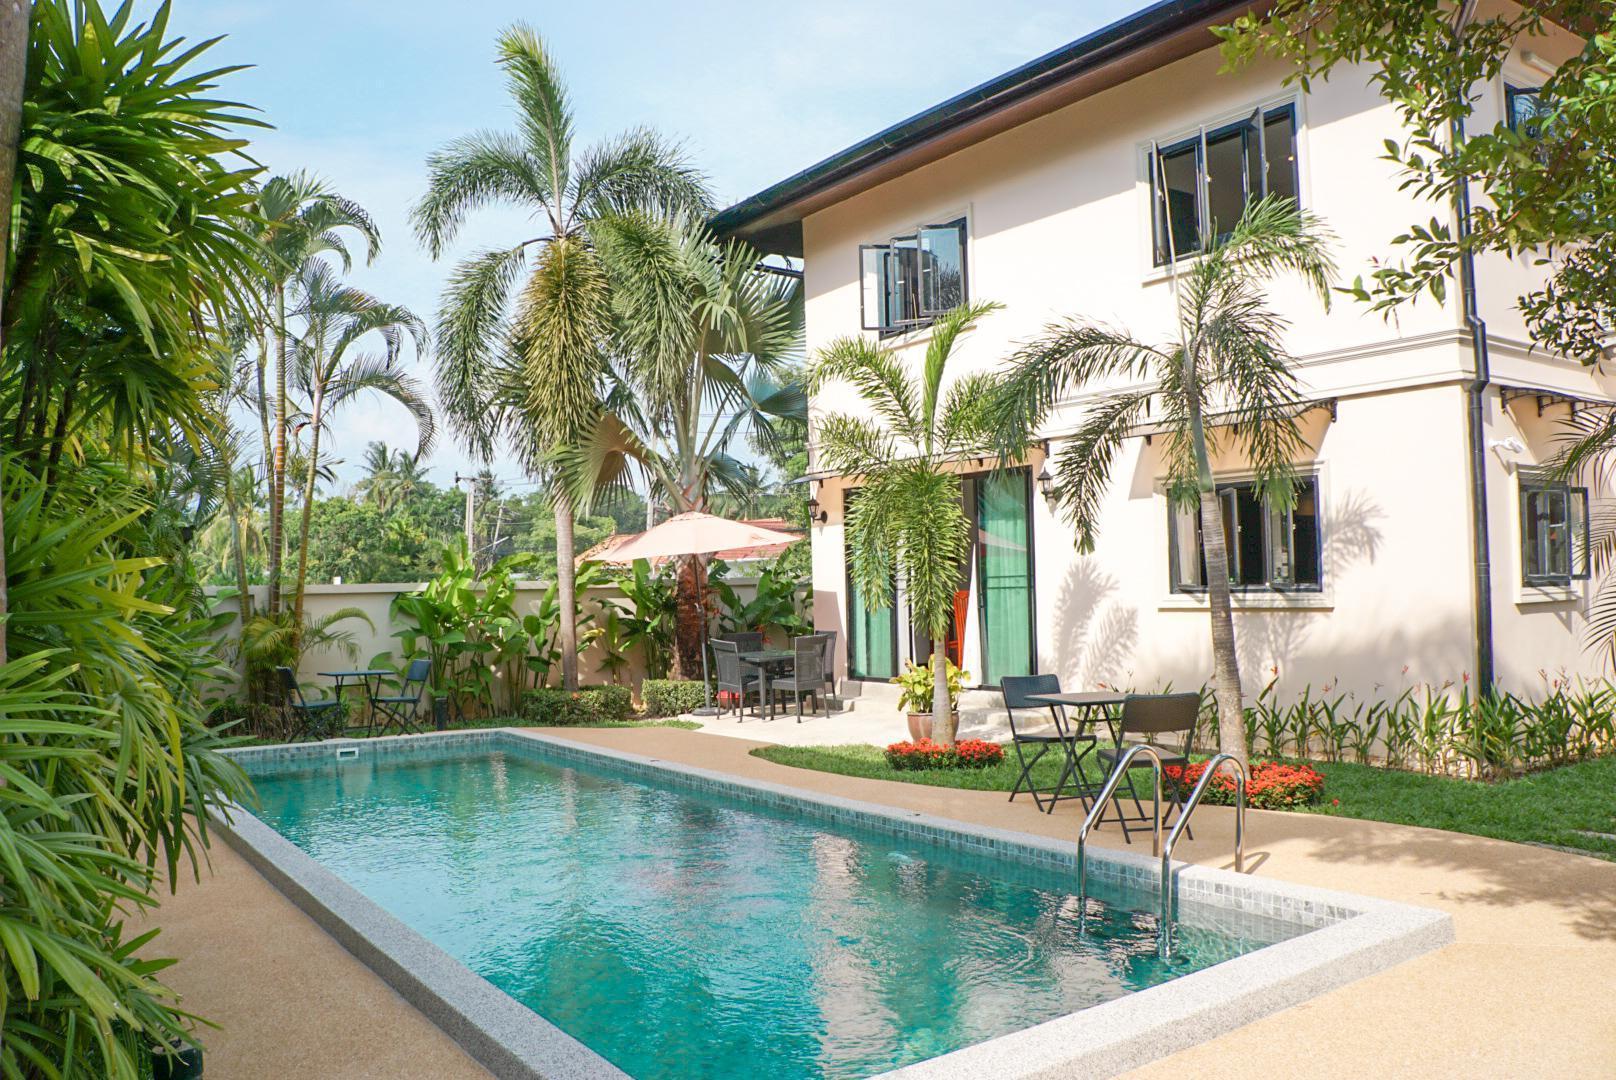 Villa fifth ocean perfect for big family วิลลา 5 ห้องนอน 4 ห้องน้ำส่วนตัว ขนาด 300 ตร.ม. – ในหาน